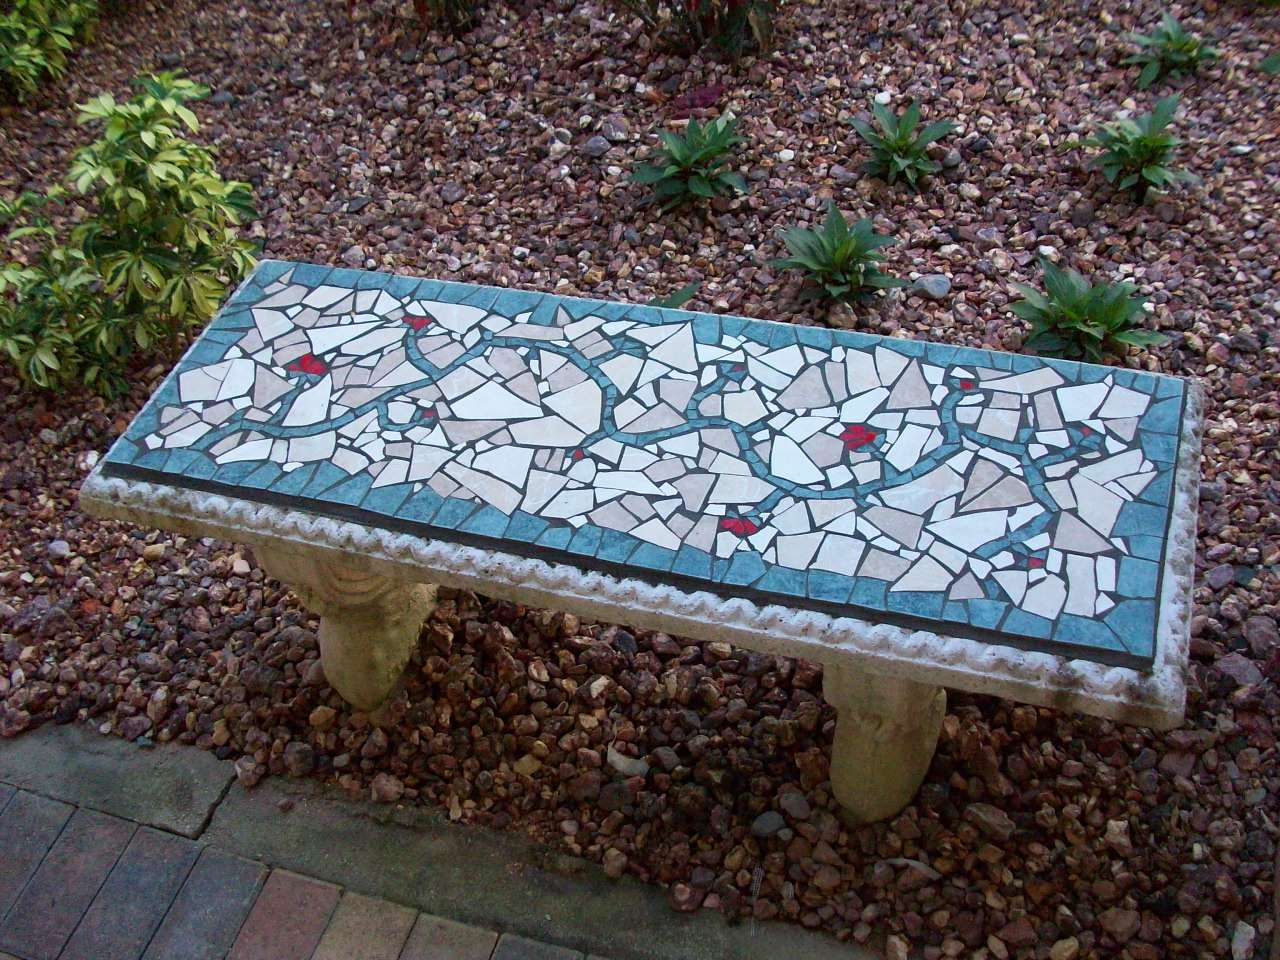 Remarkable Garden Bench Mosaic Garden Art Mosaic Garden Art Mosaic Uwap Interior Chair Design Uwaporg